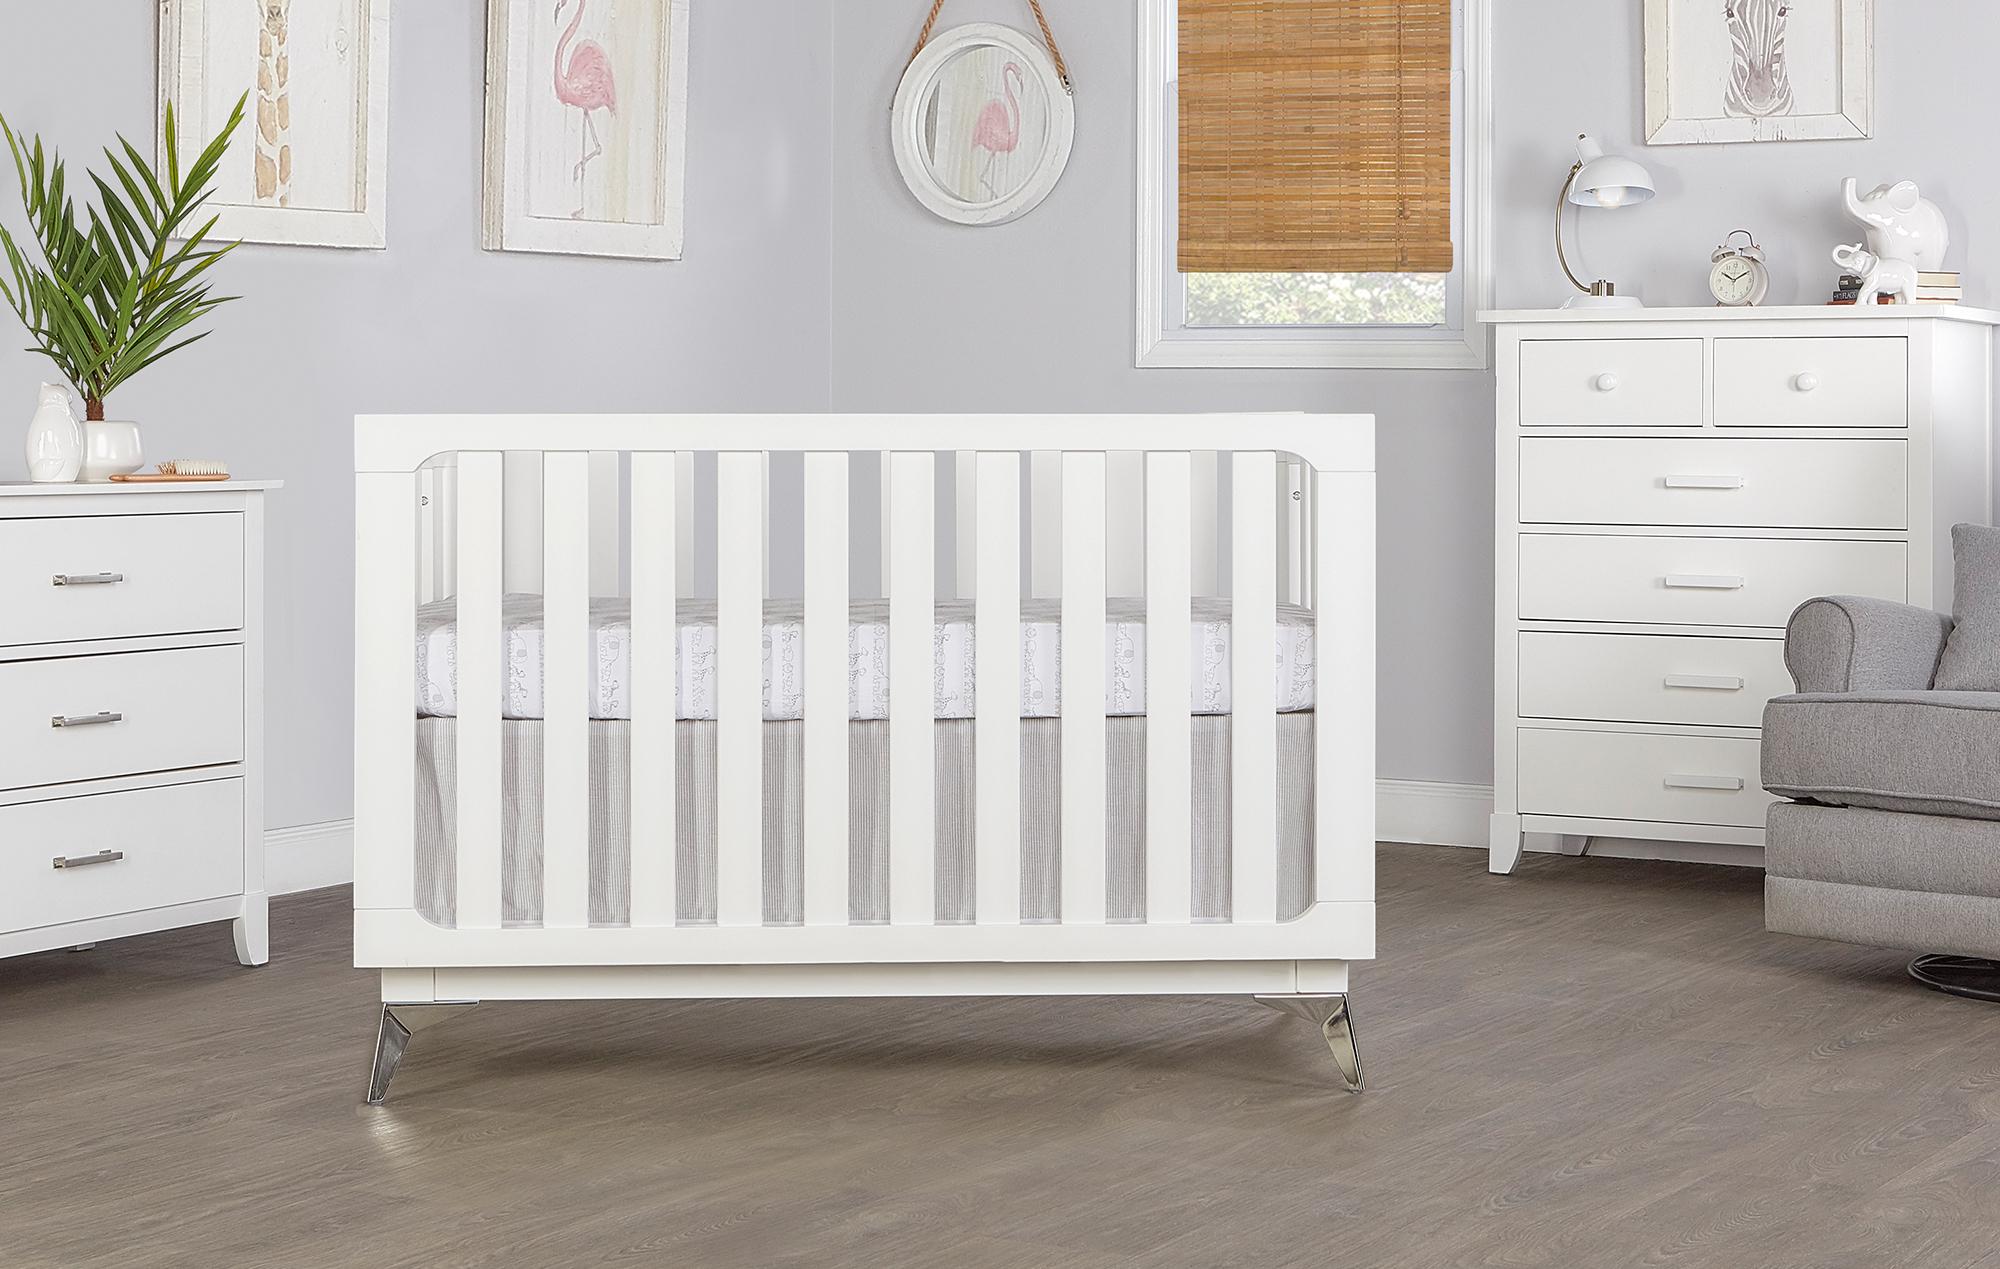 770_W Ultra Modern Crib Room Shot Front